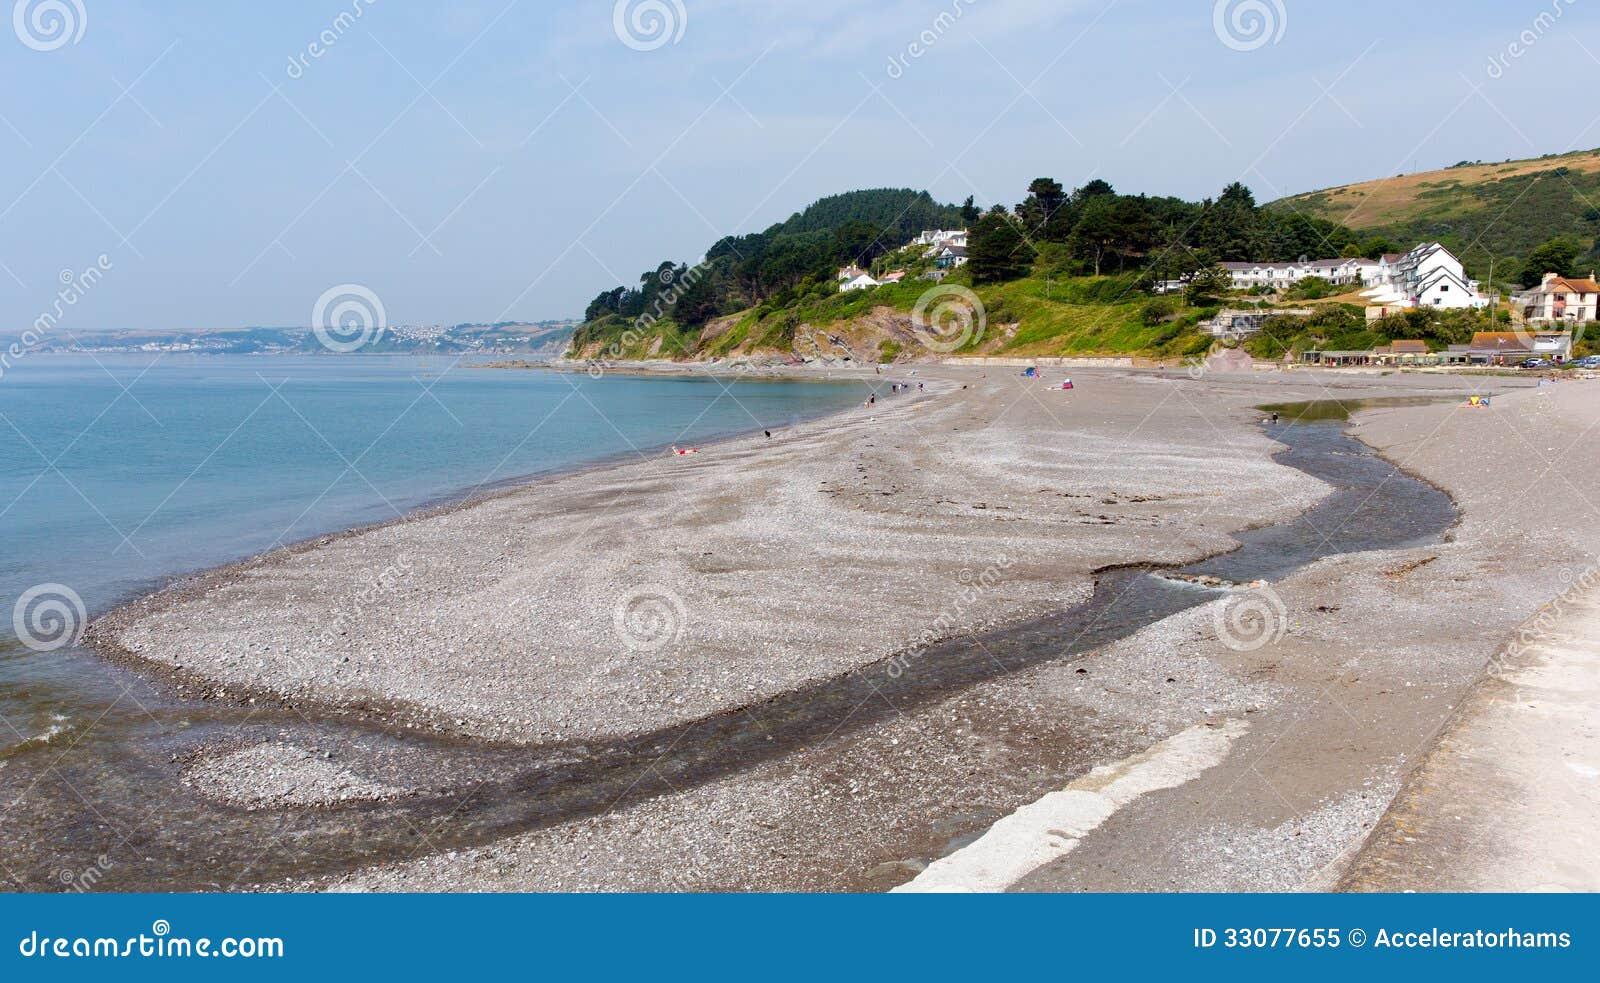 Download Seaton Beach Cornwall Near Looe England, United Kingdom Stock Image - Image of scenic, cornish: 33077655